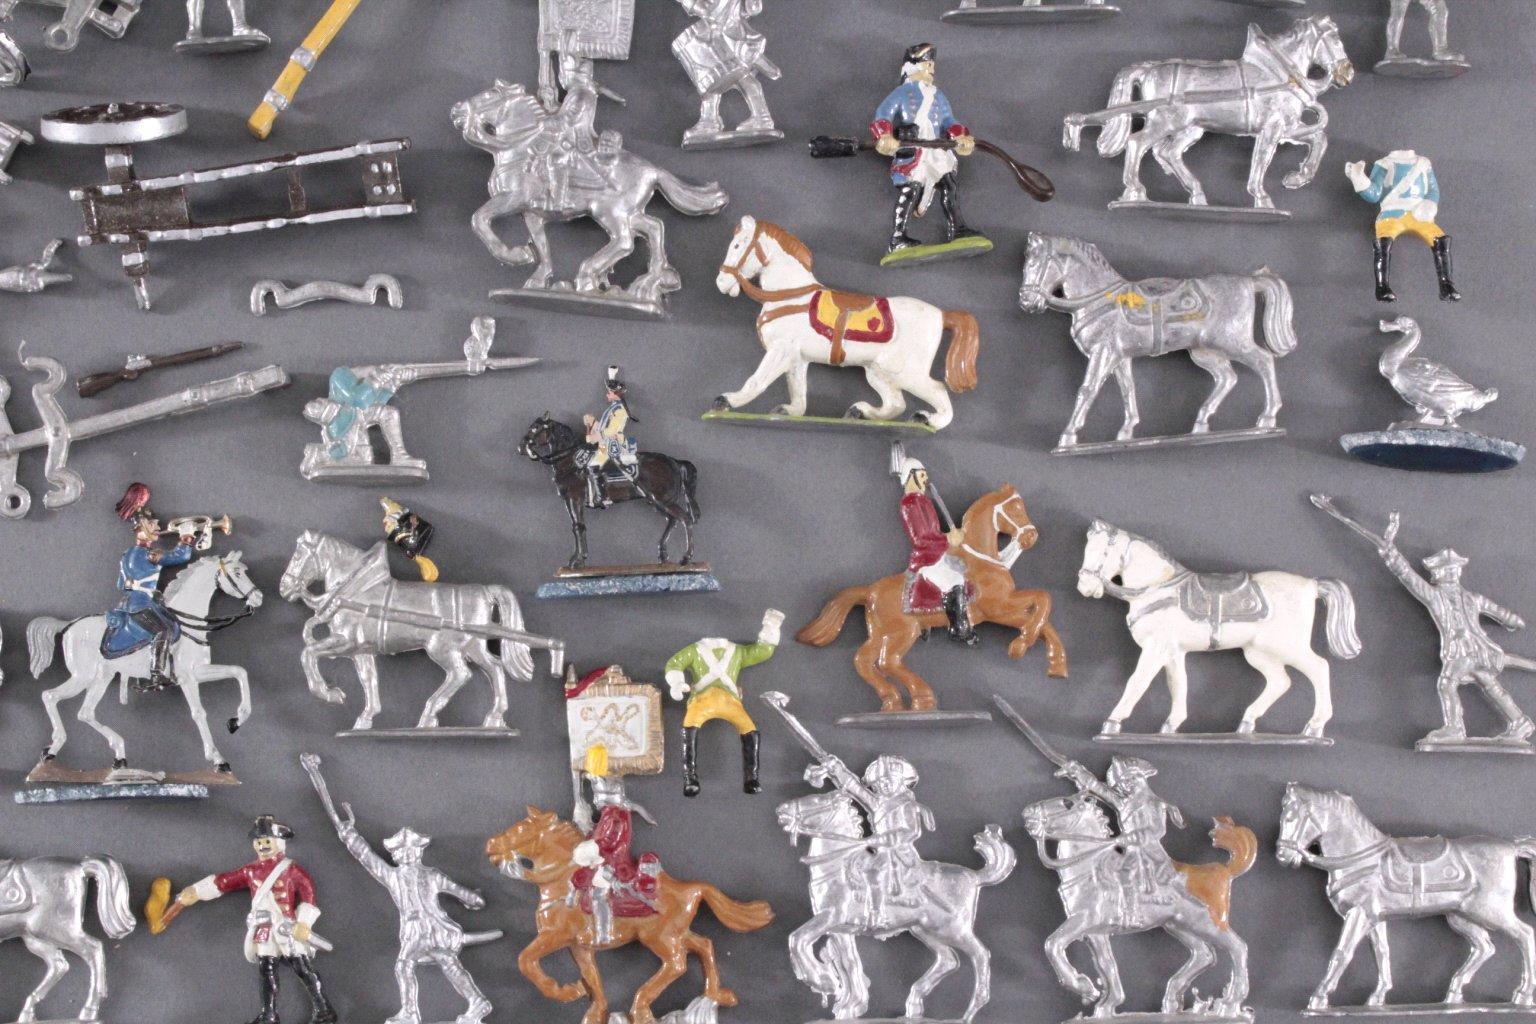 Sammlung Zinnfiguren, weit über 60 Stück-5